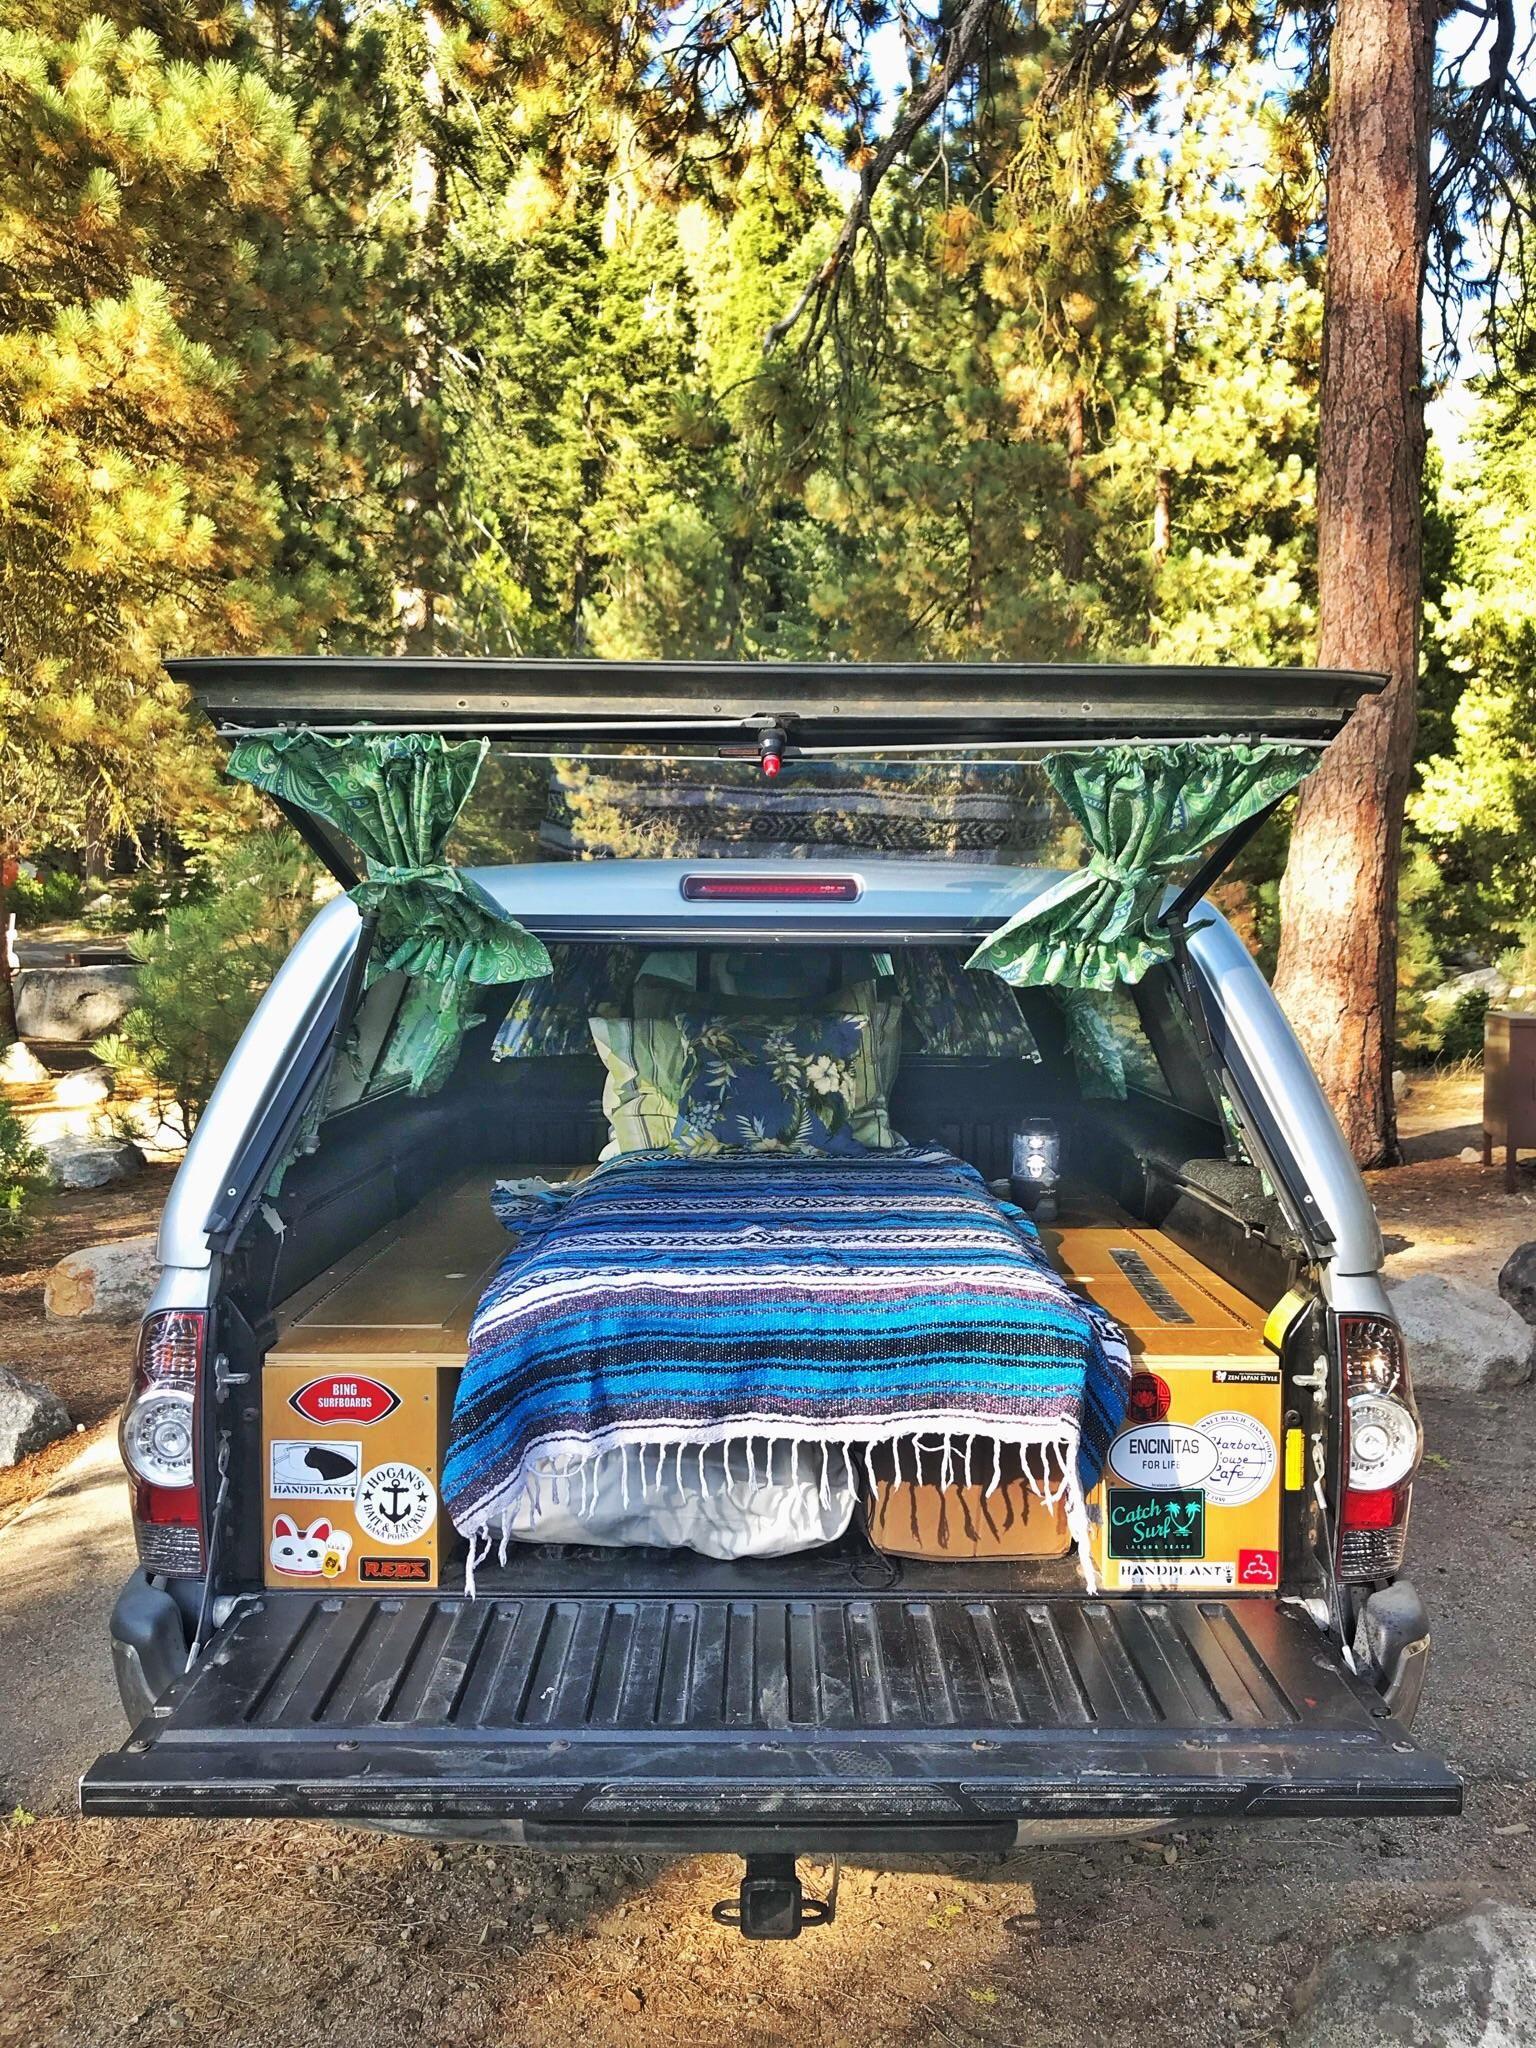 Pin by Dan Adventurer on Camping Camper shells, Truck